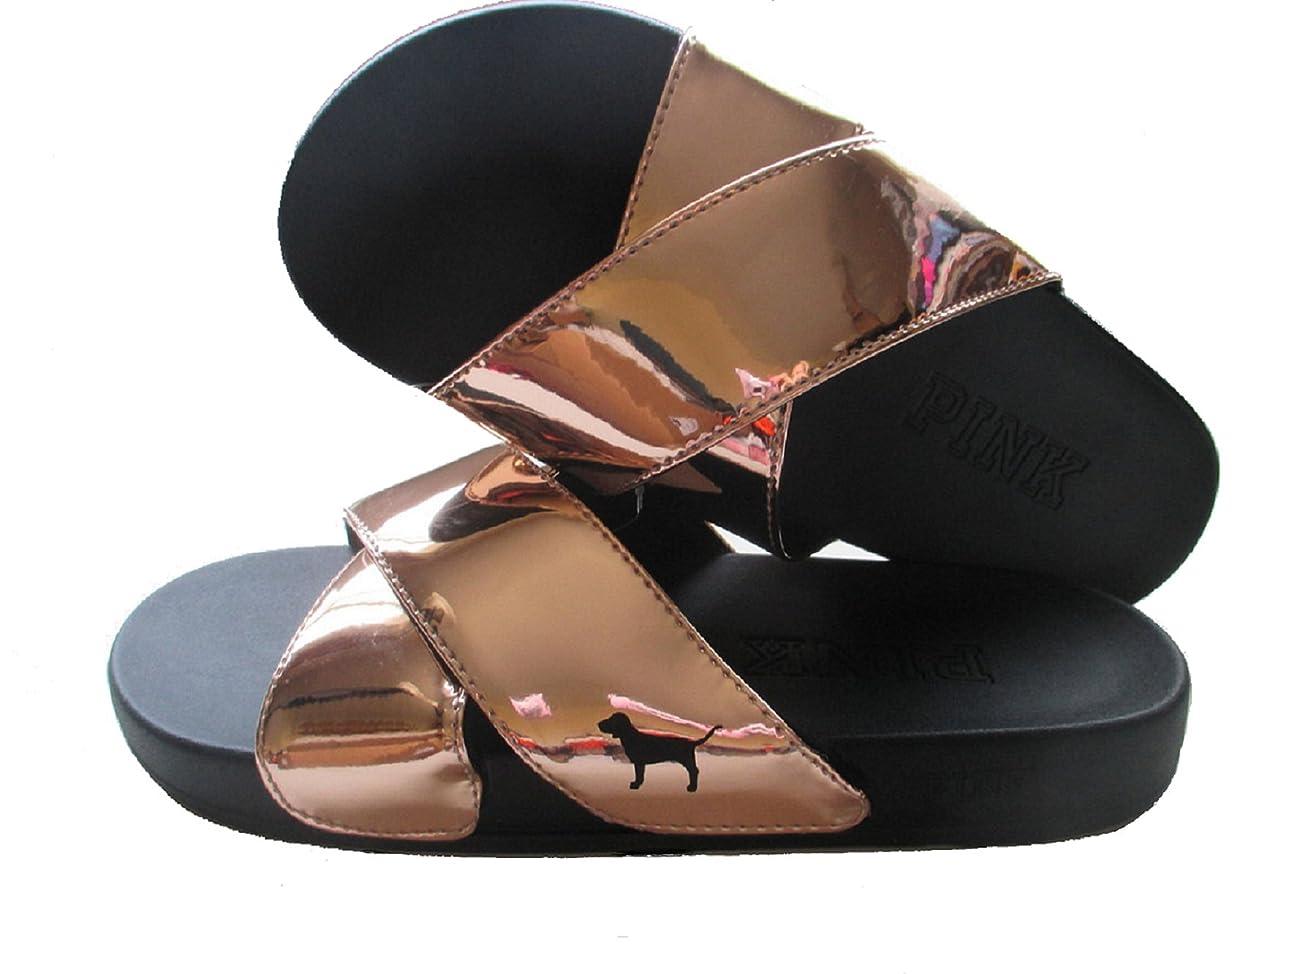 d84cd606a531d ALDO Women's Thoalle Slide Sandal cjcovj14269 - yallaseyanah.com